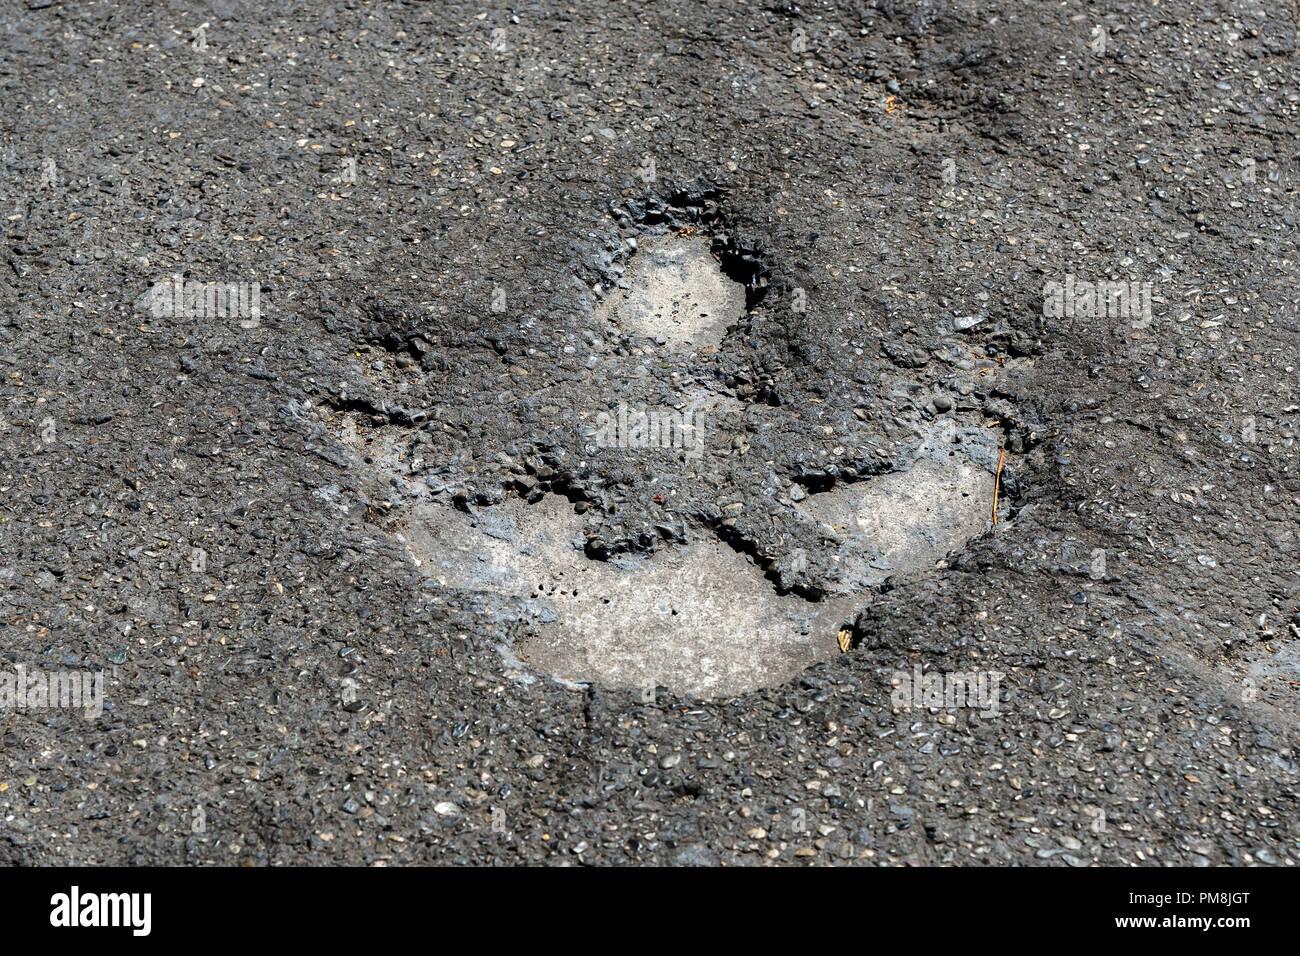 Dinosaur footprints, Royal British Columbia Museum, Victoria, capital of British Columbia, Canada - Stock Image